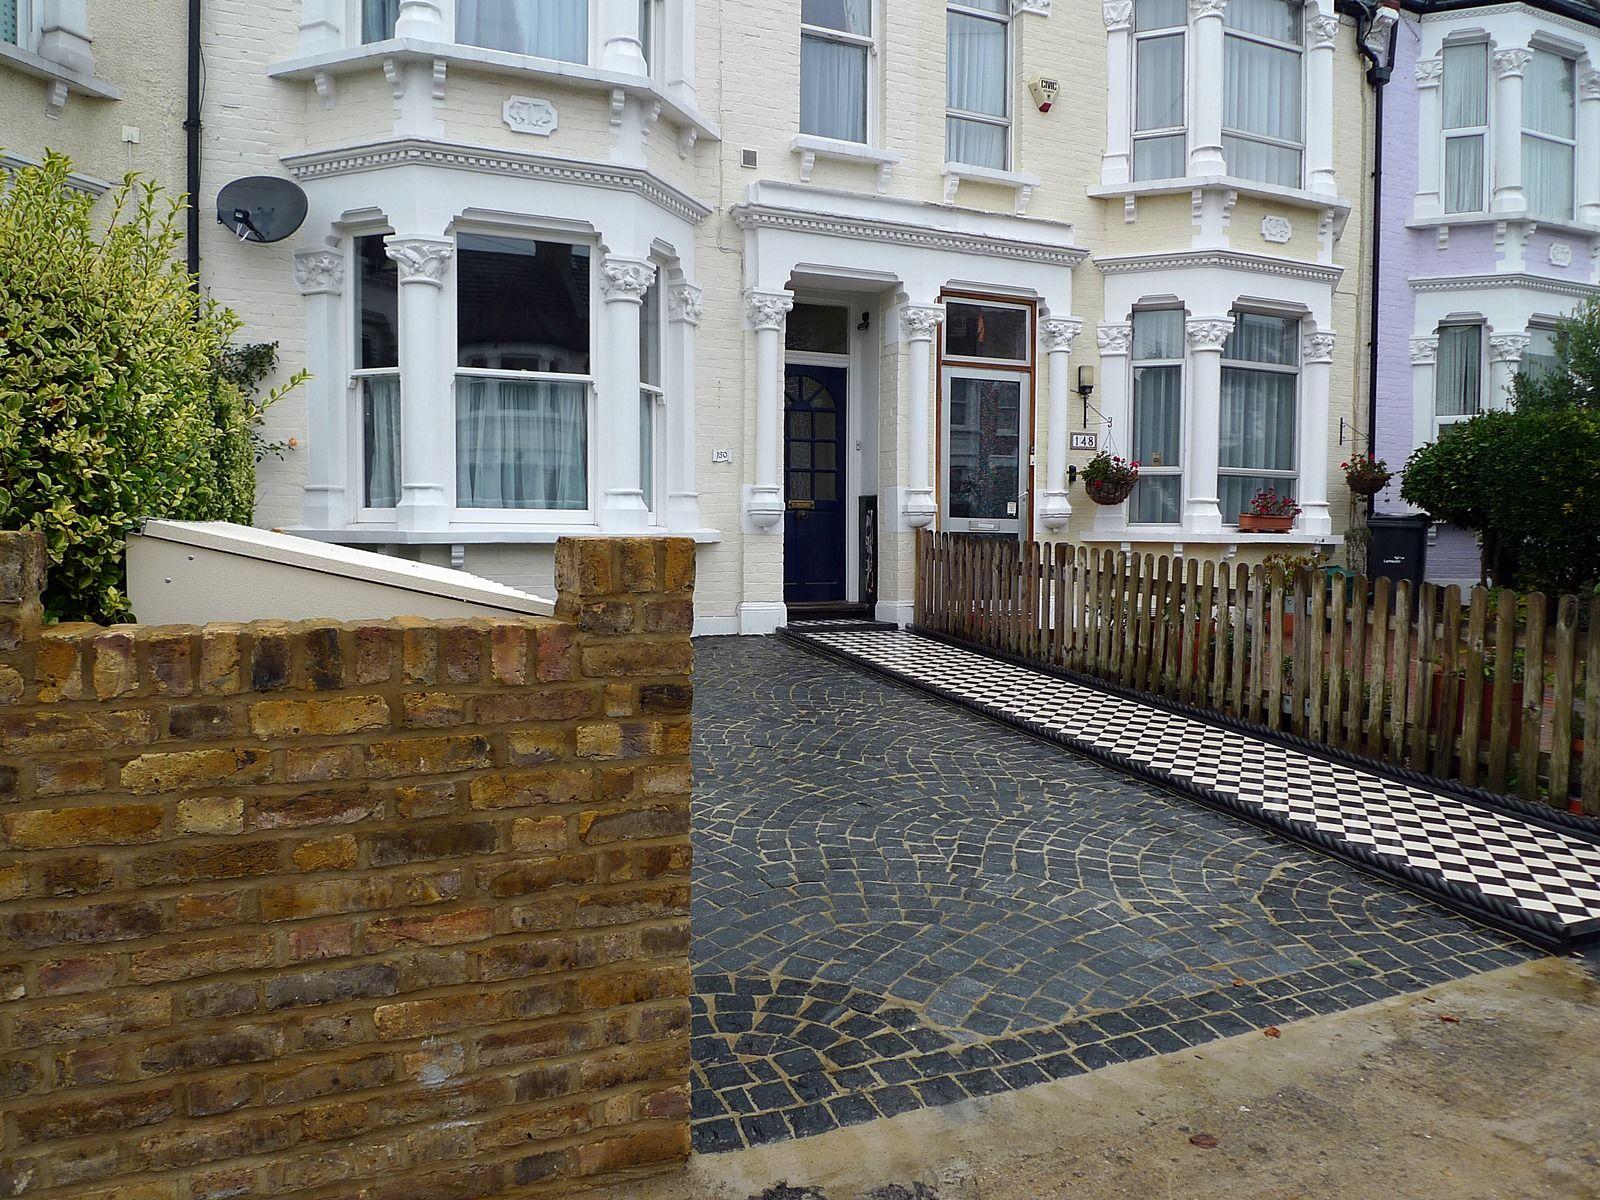 blaock-paving-driveway-and-mosaic-tile-path-streatham-london